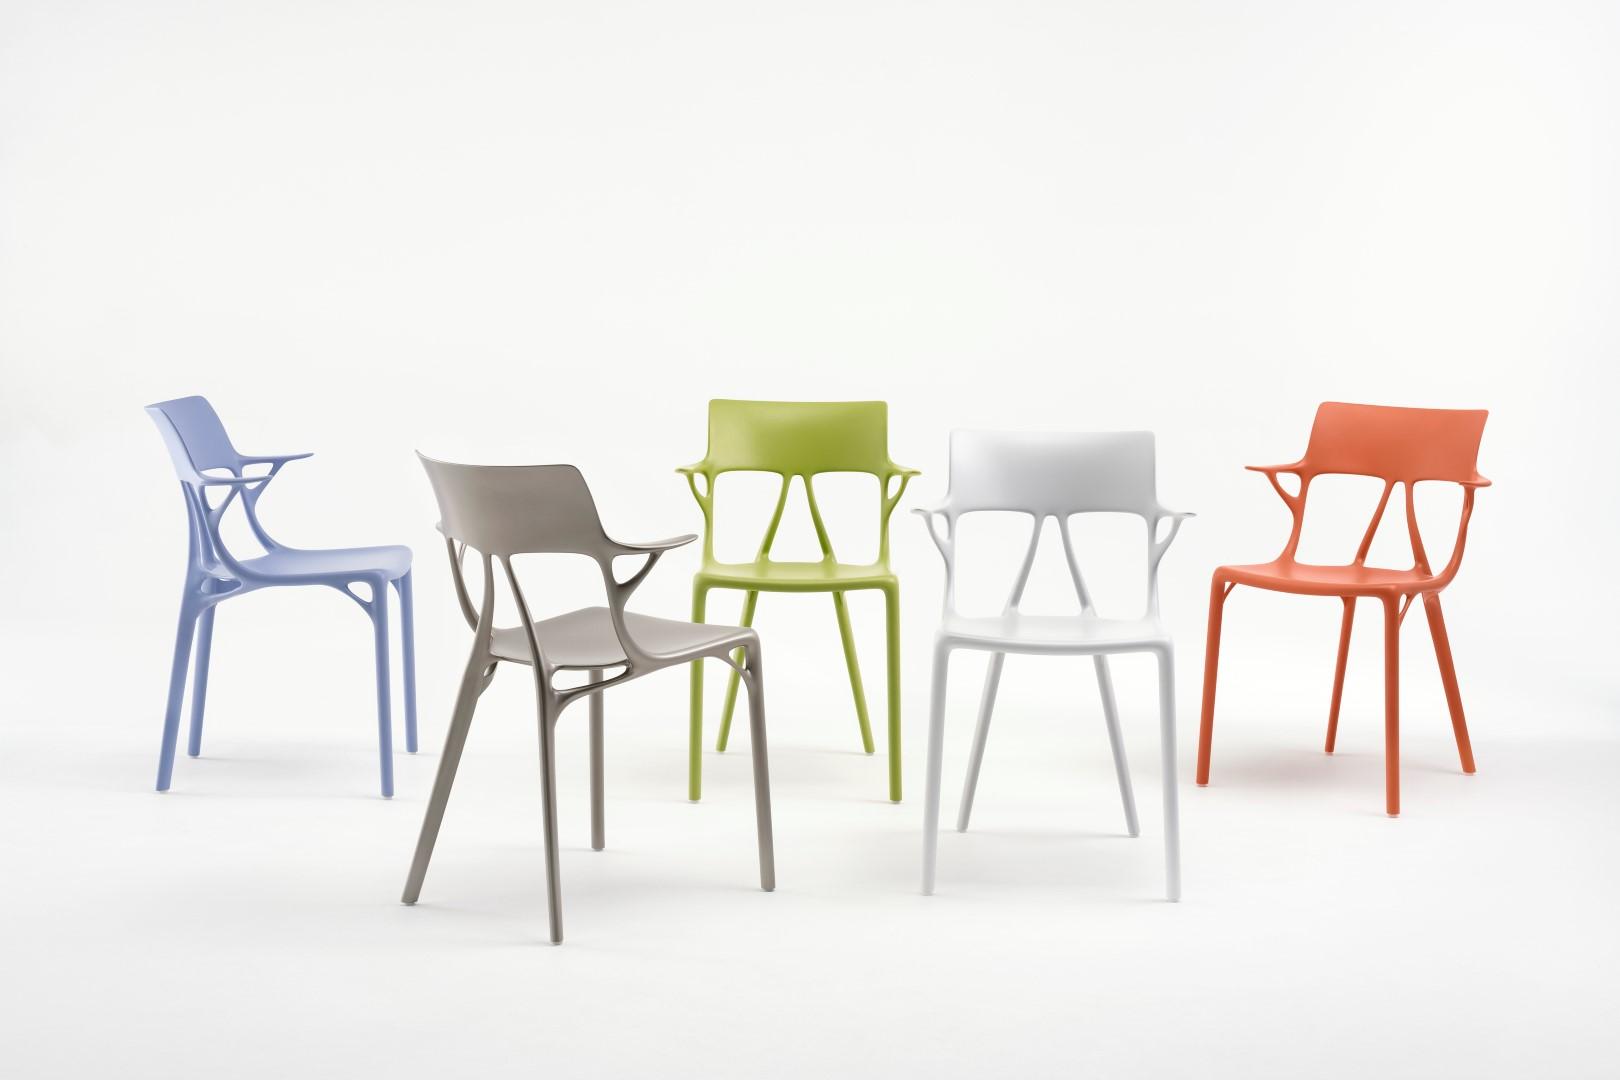 Kartell Philippe Starck 2019